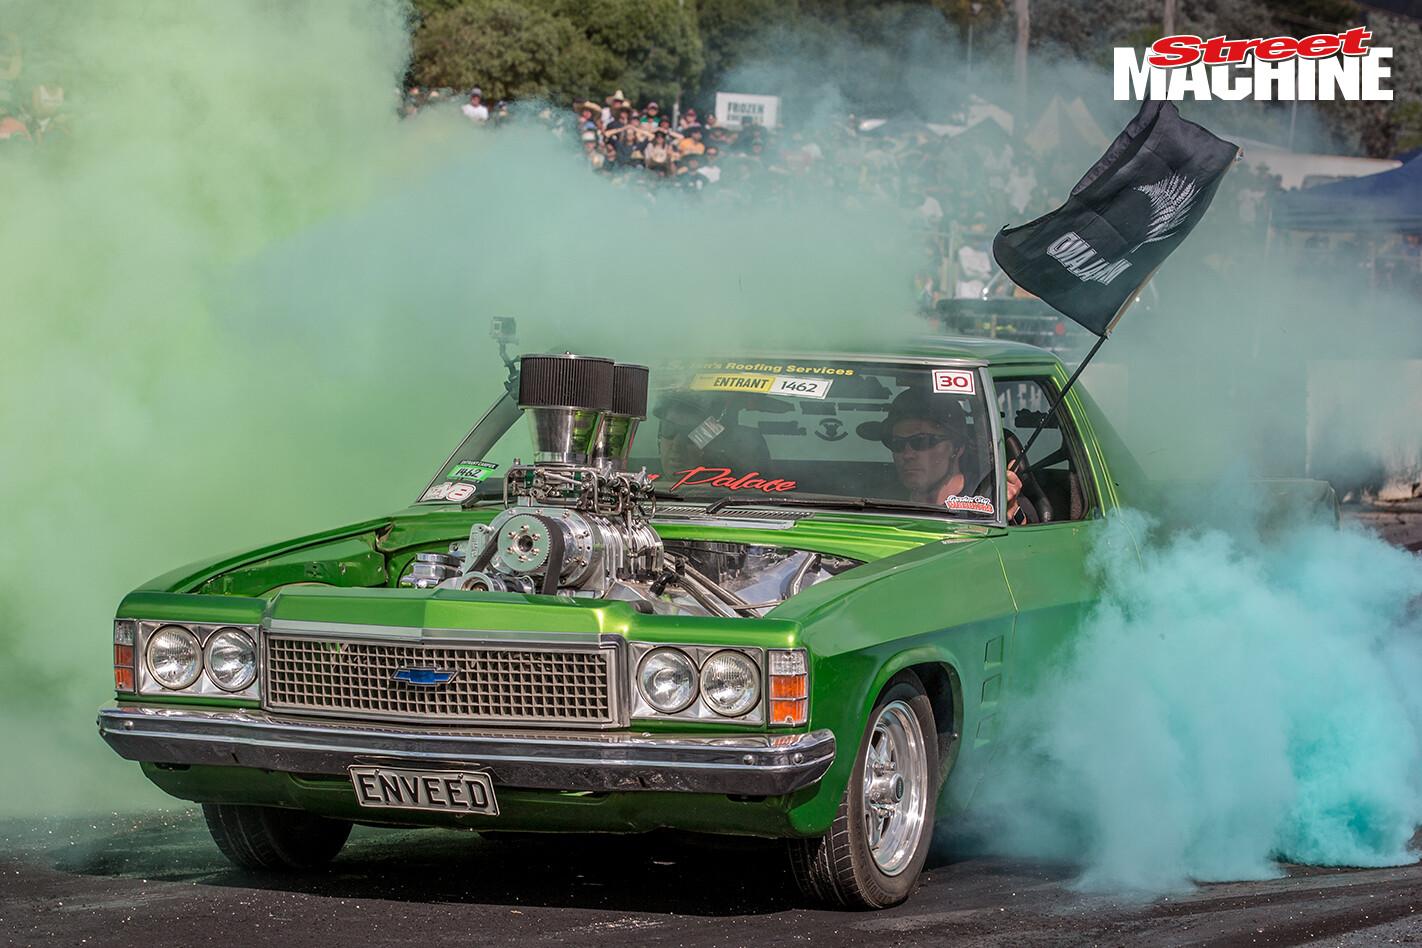 HZ Holden Ute ENVEED Burnout